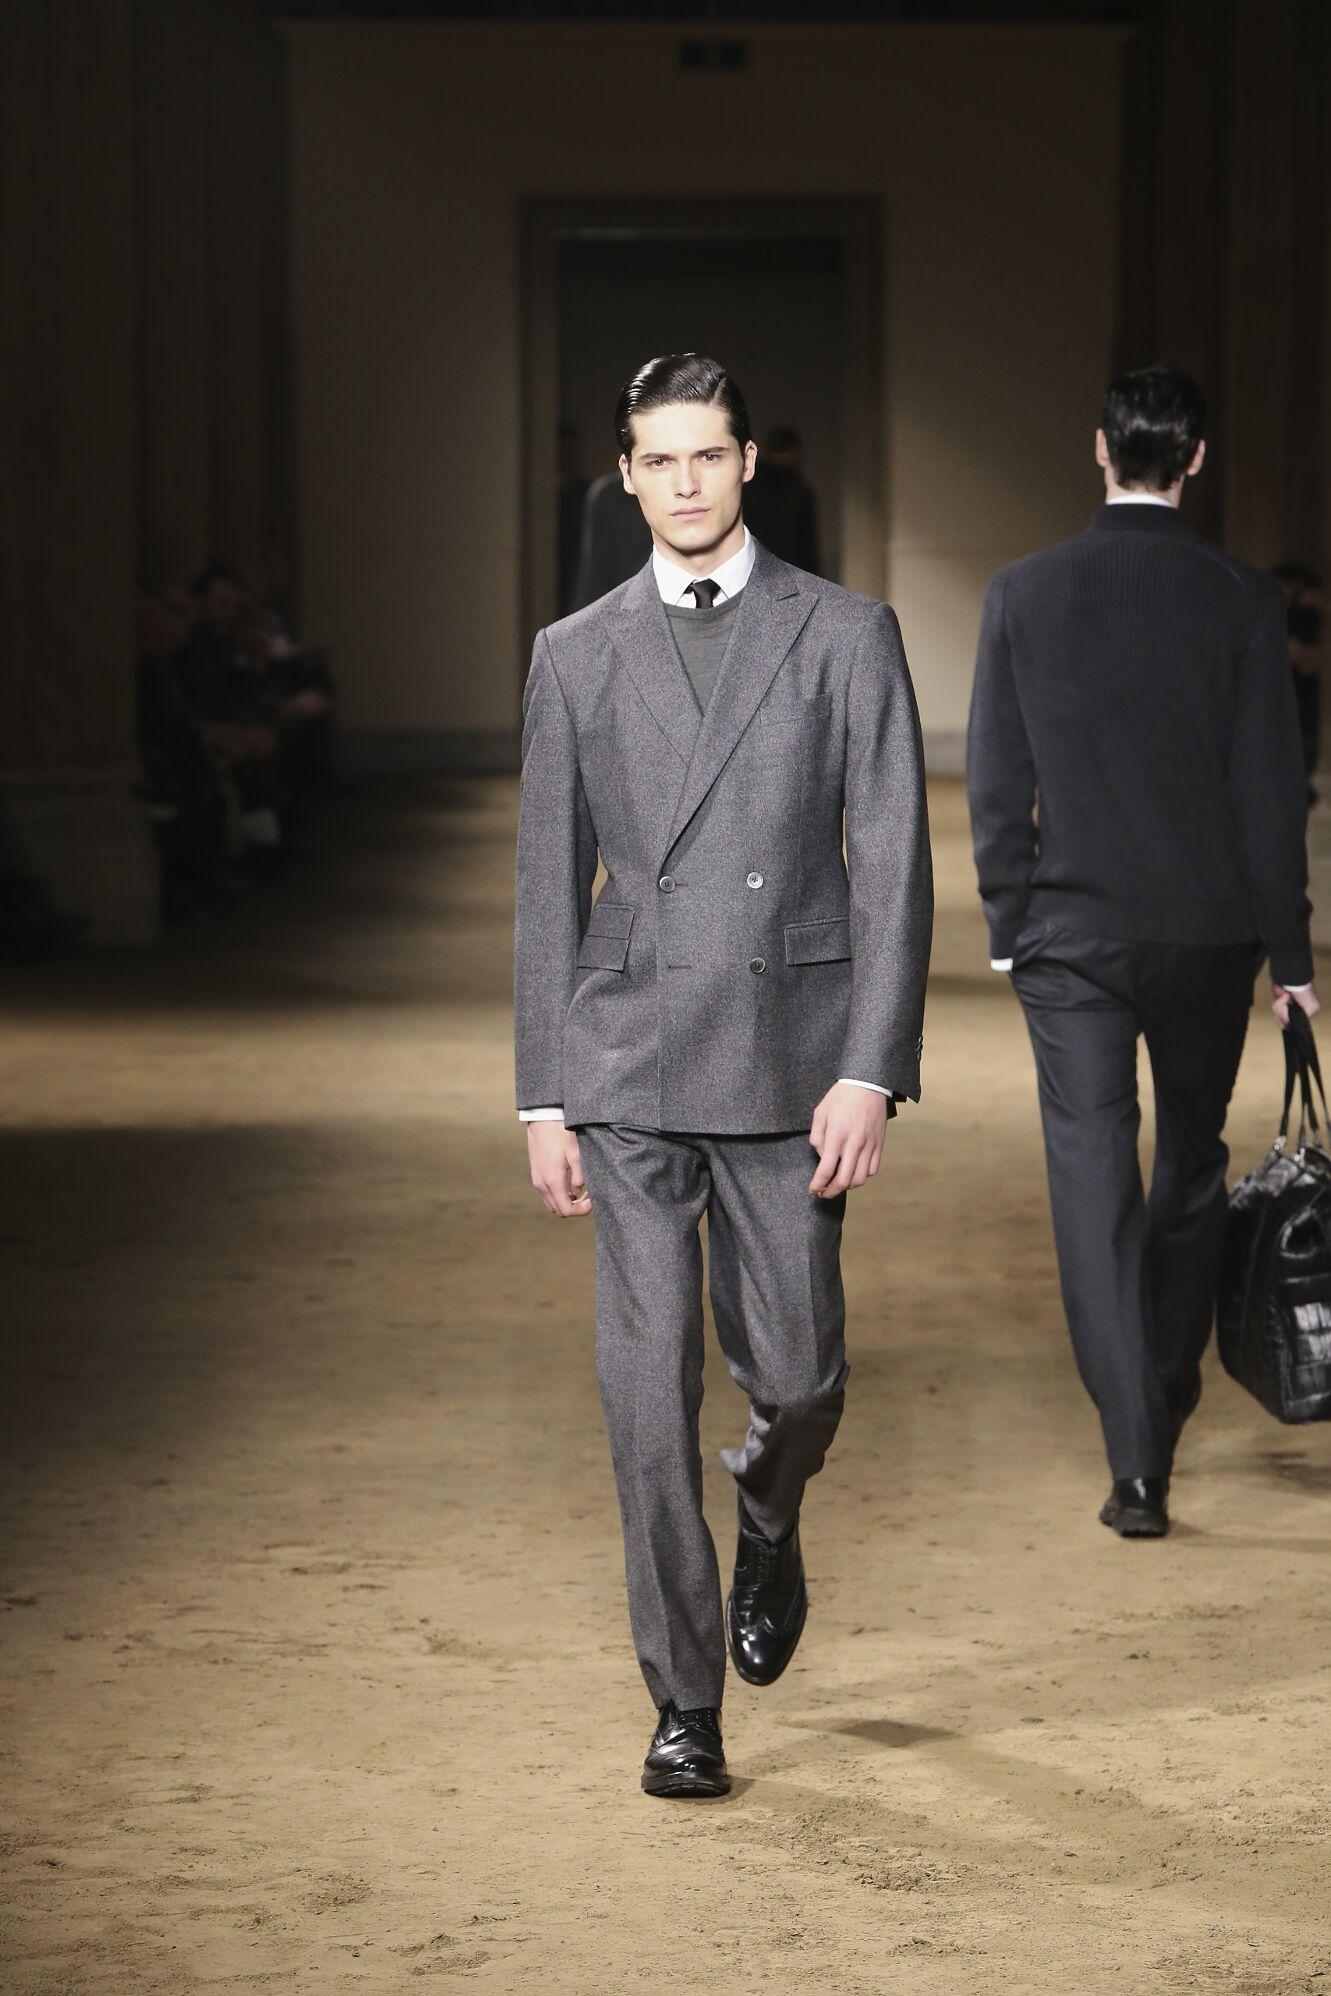 Fall Fashion Man Suit